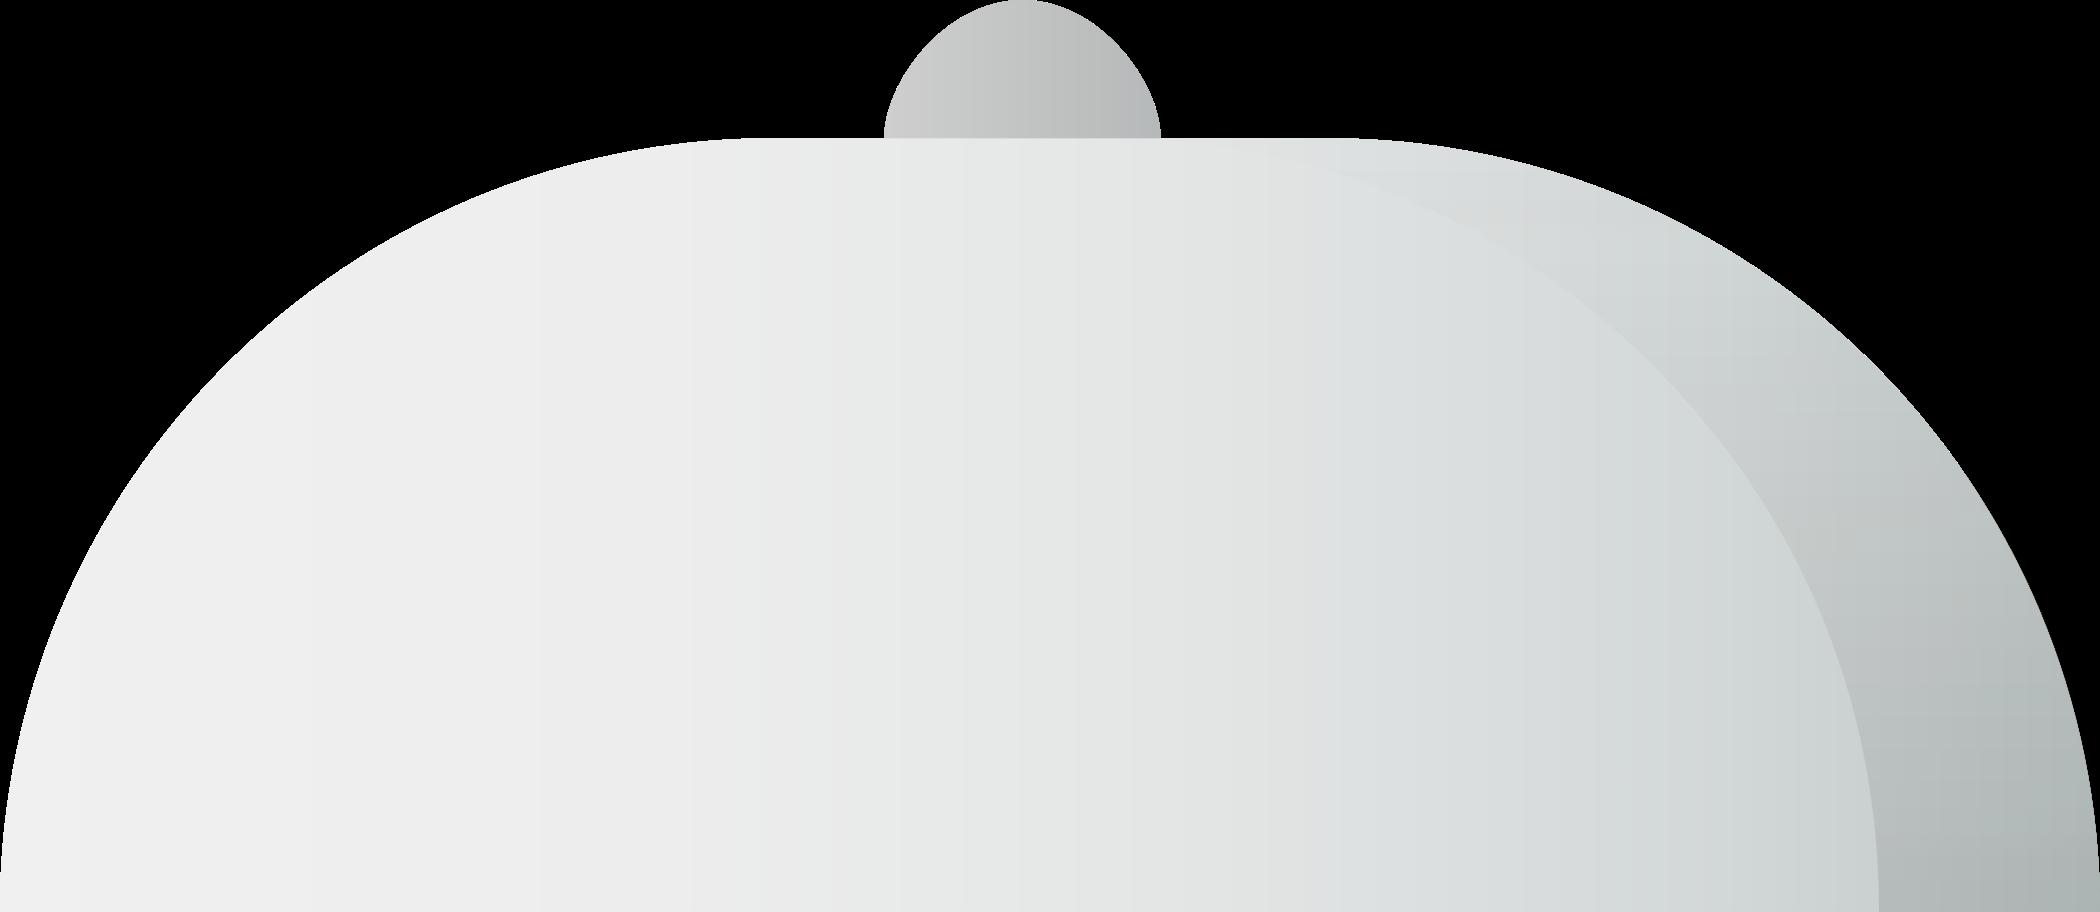 tablewear Clipart illustration in PNG, SVG